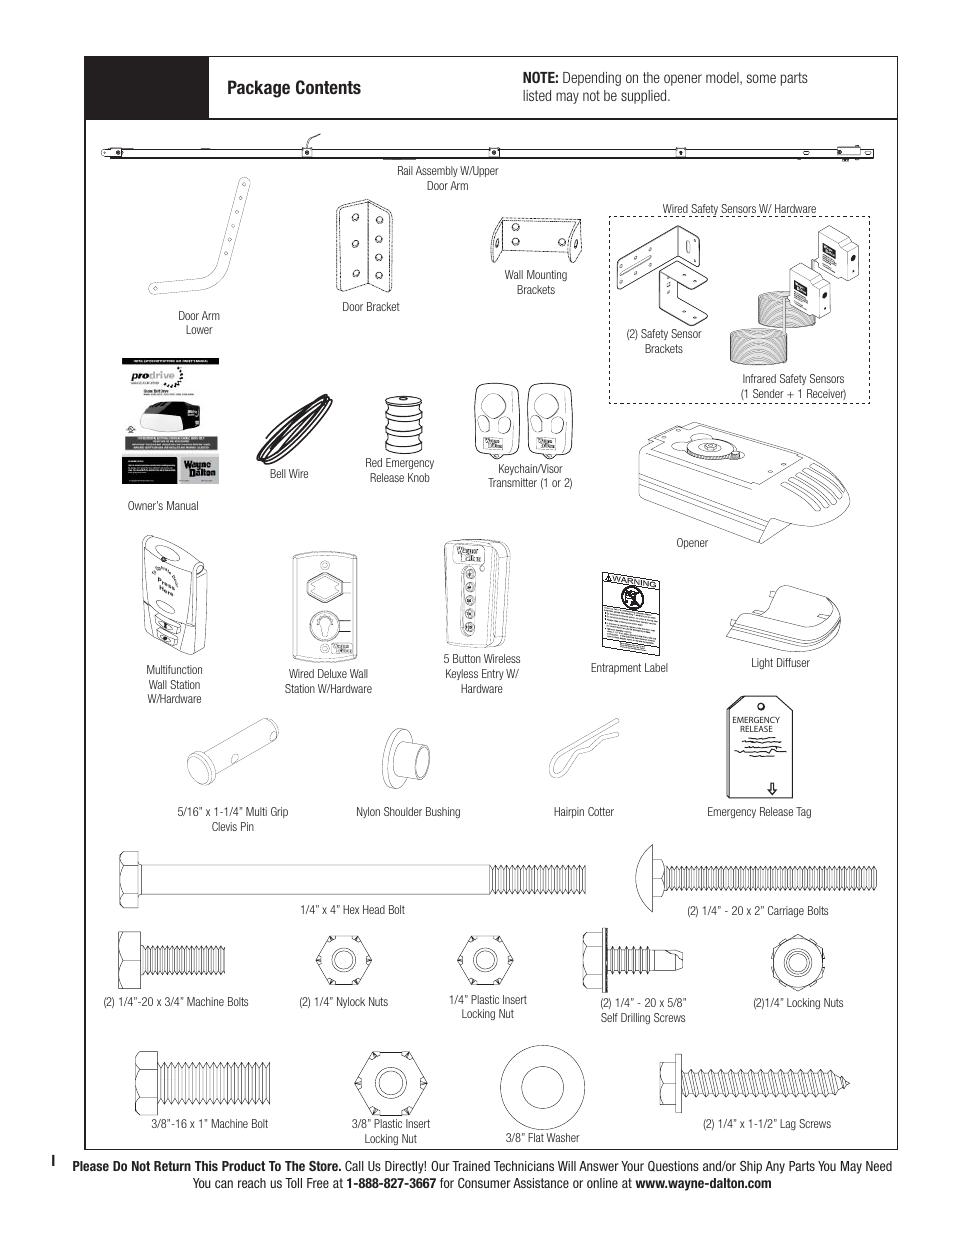 Package Contents Wayne Dalton Prodrive 3222c Z User